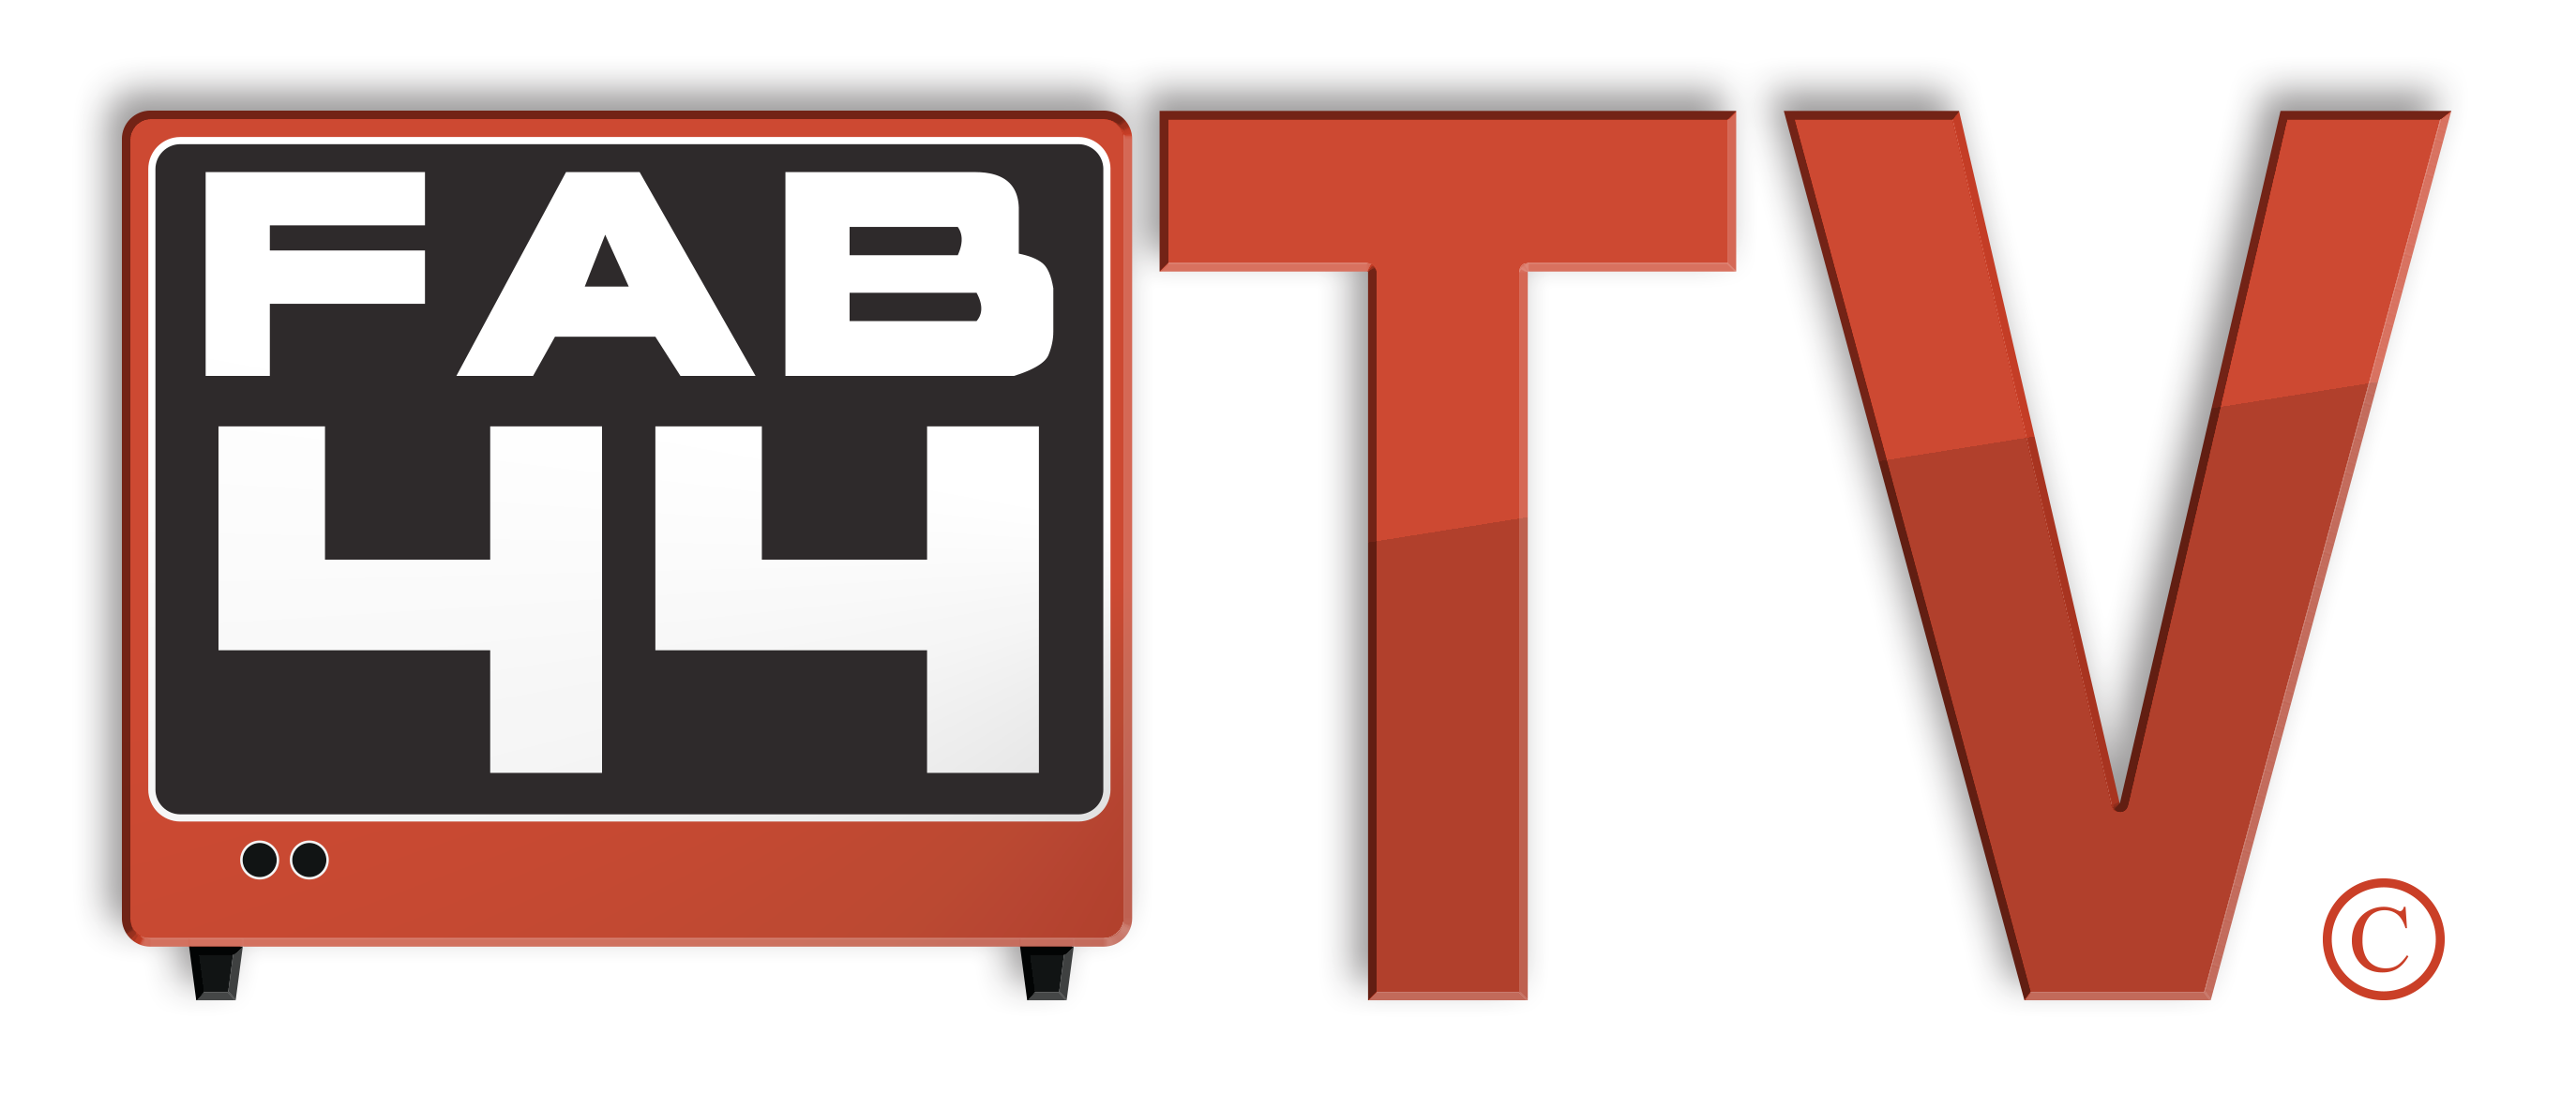 FAB44 Media